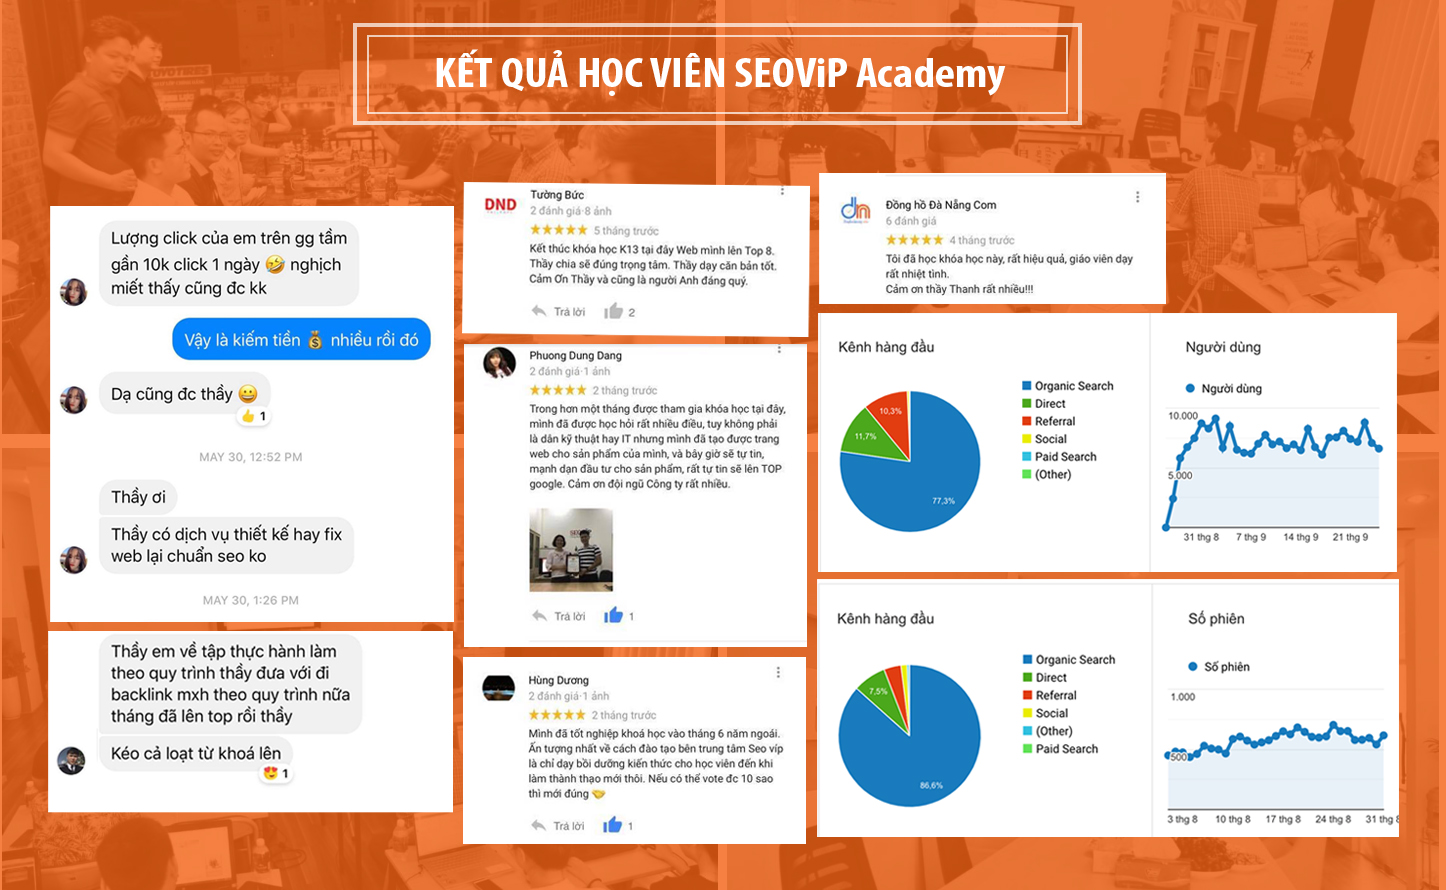 Kết quả học viên SEOViP Academy